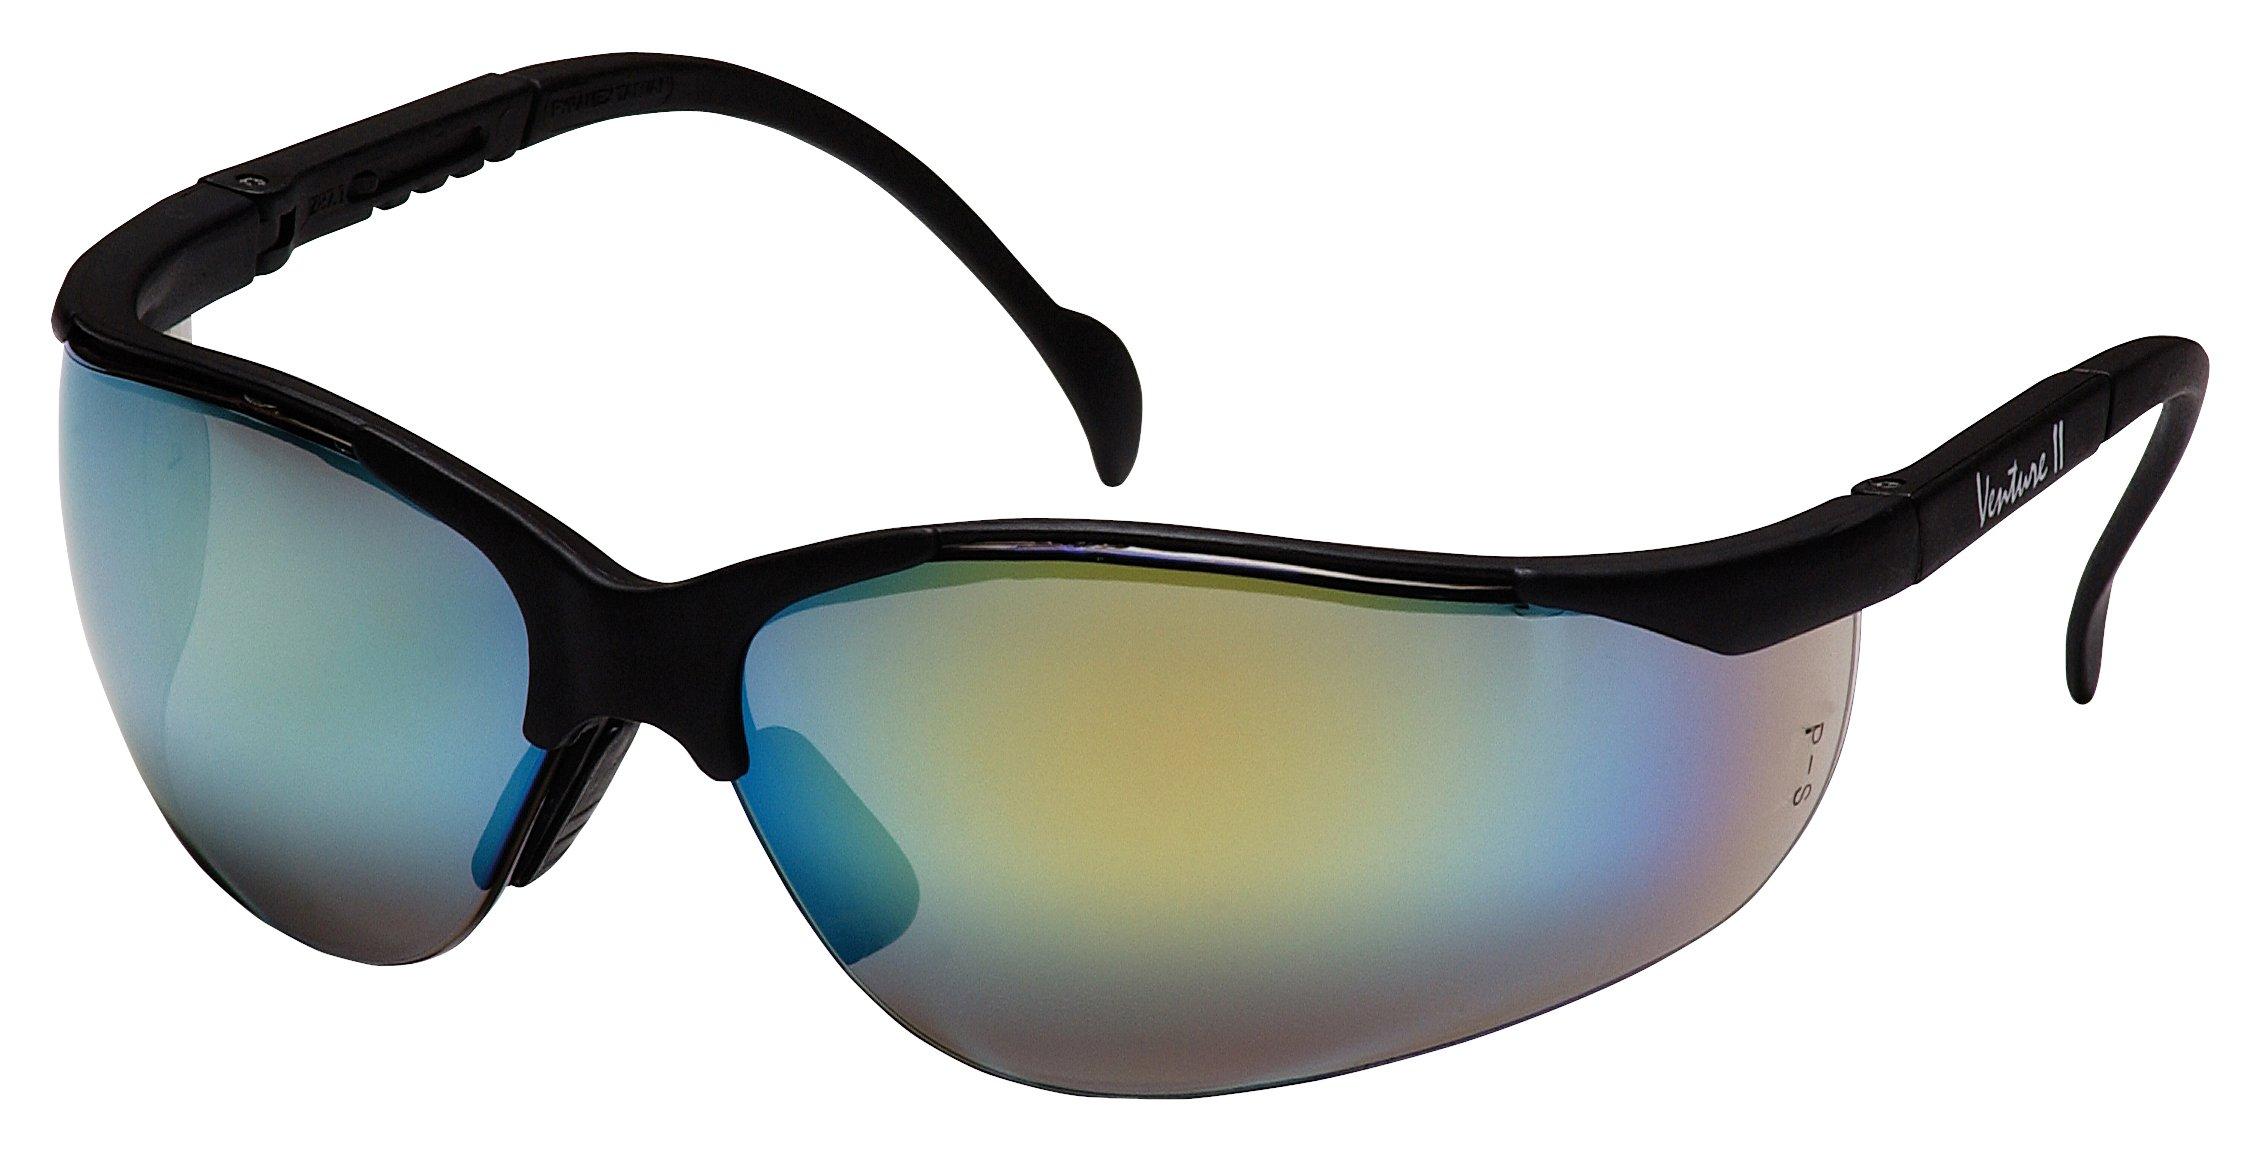 Pyramex Venture Ii Safety Eyewear, Gold Mirror Lens With Black Frame